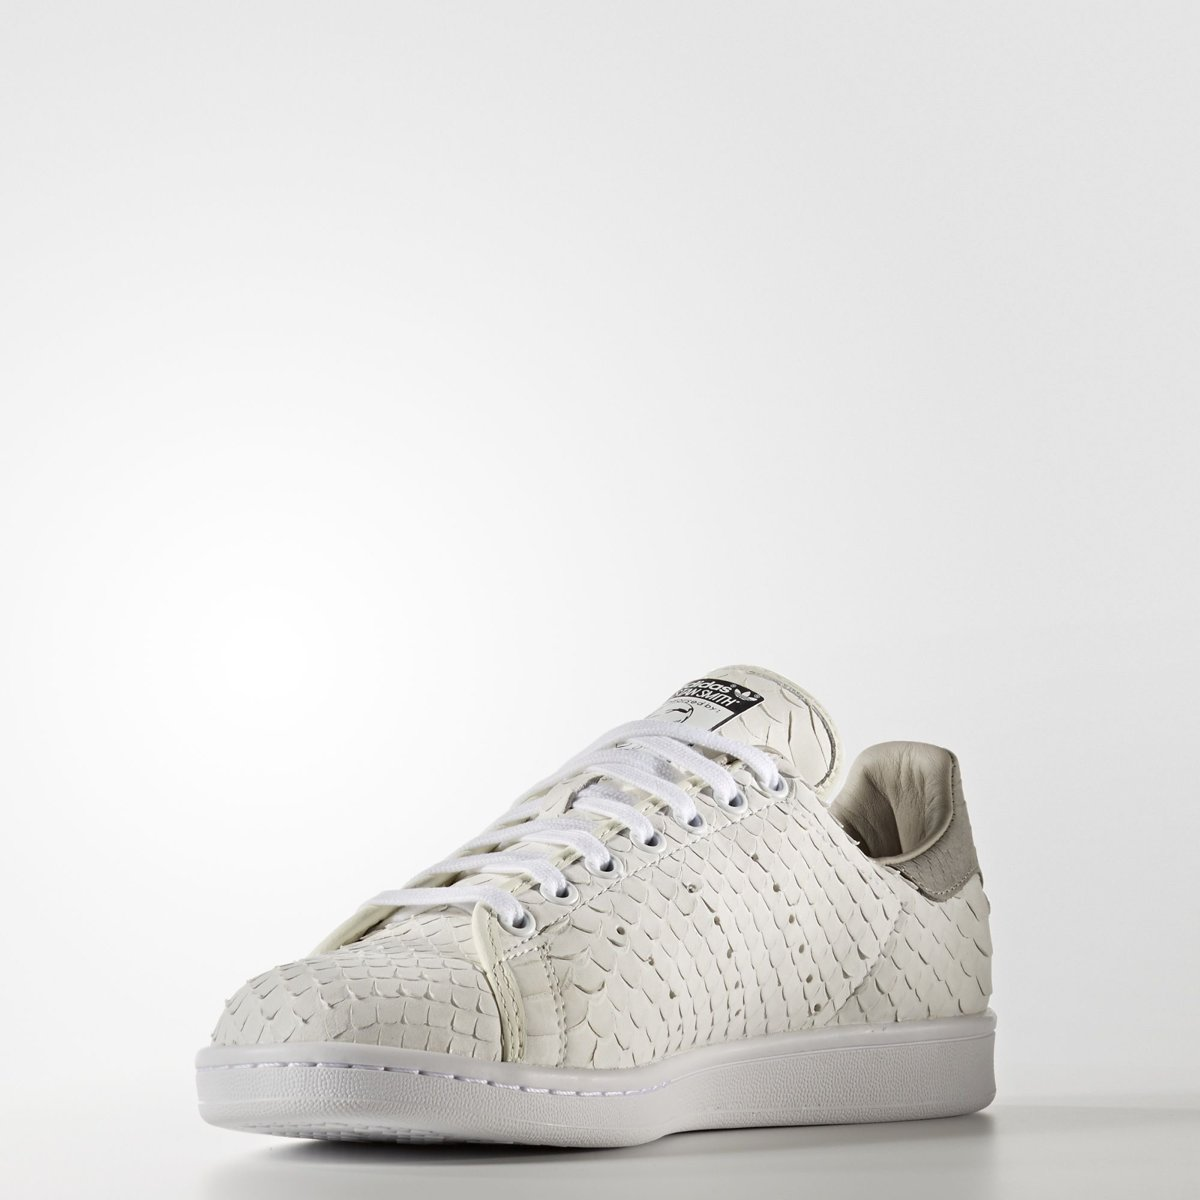 Chaussures Adidas Stan Smith Decon - Chaussures De Sport Blanc - Taille: 36 dUHt4D